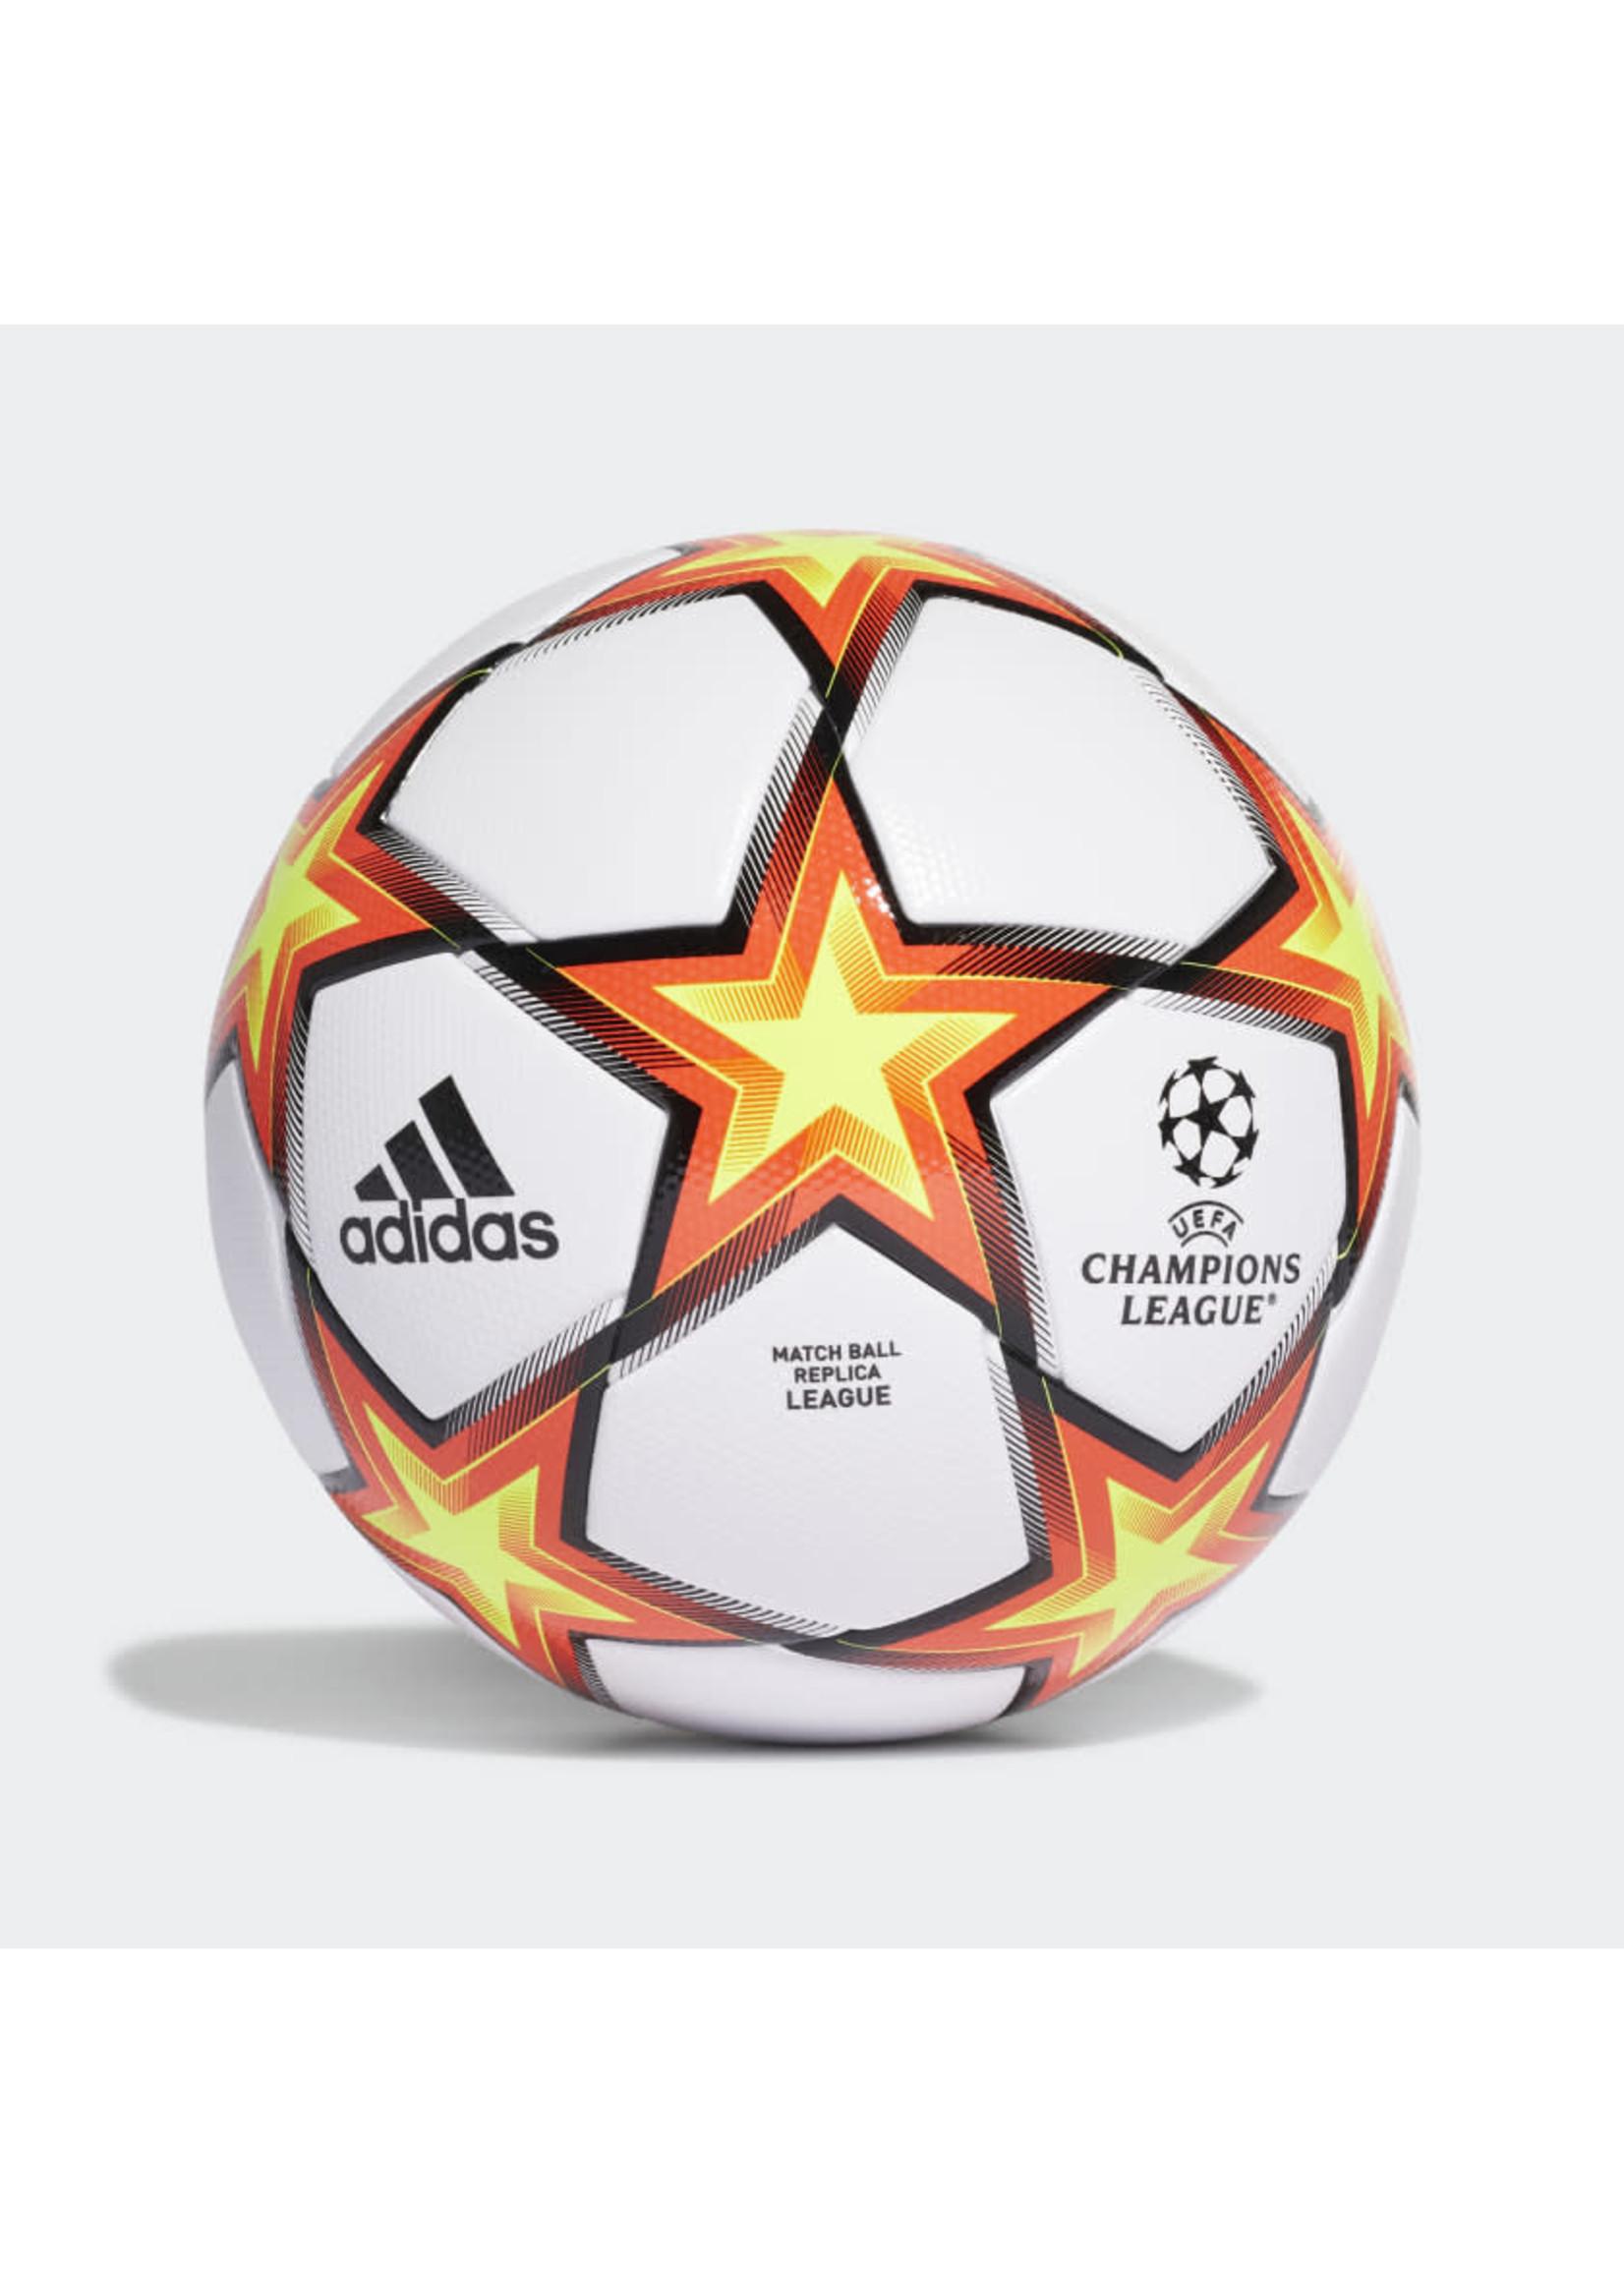 Adidas Champions League Pyrostorm League Ball